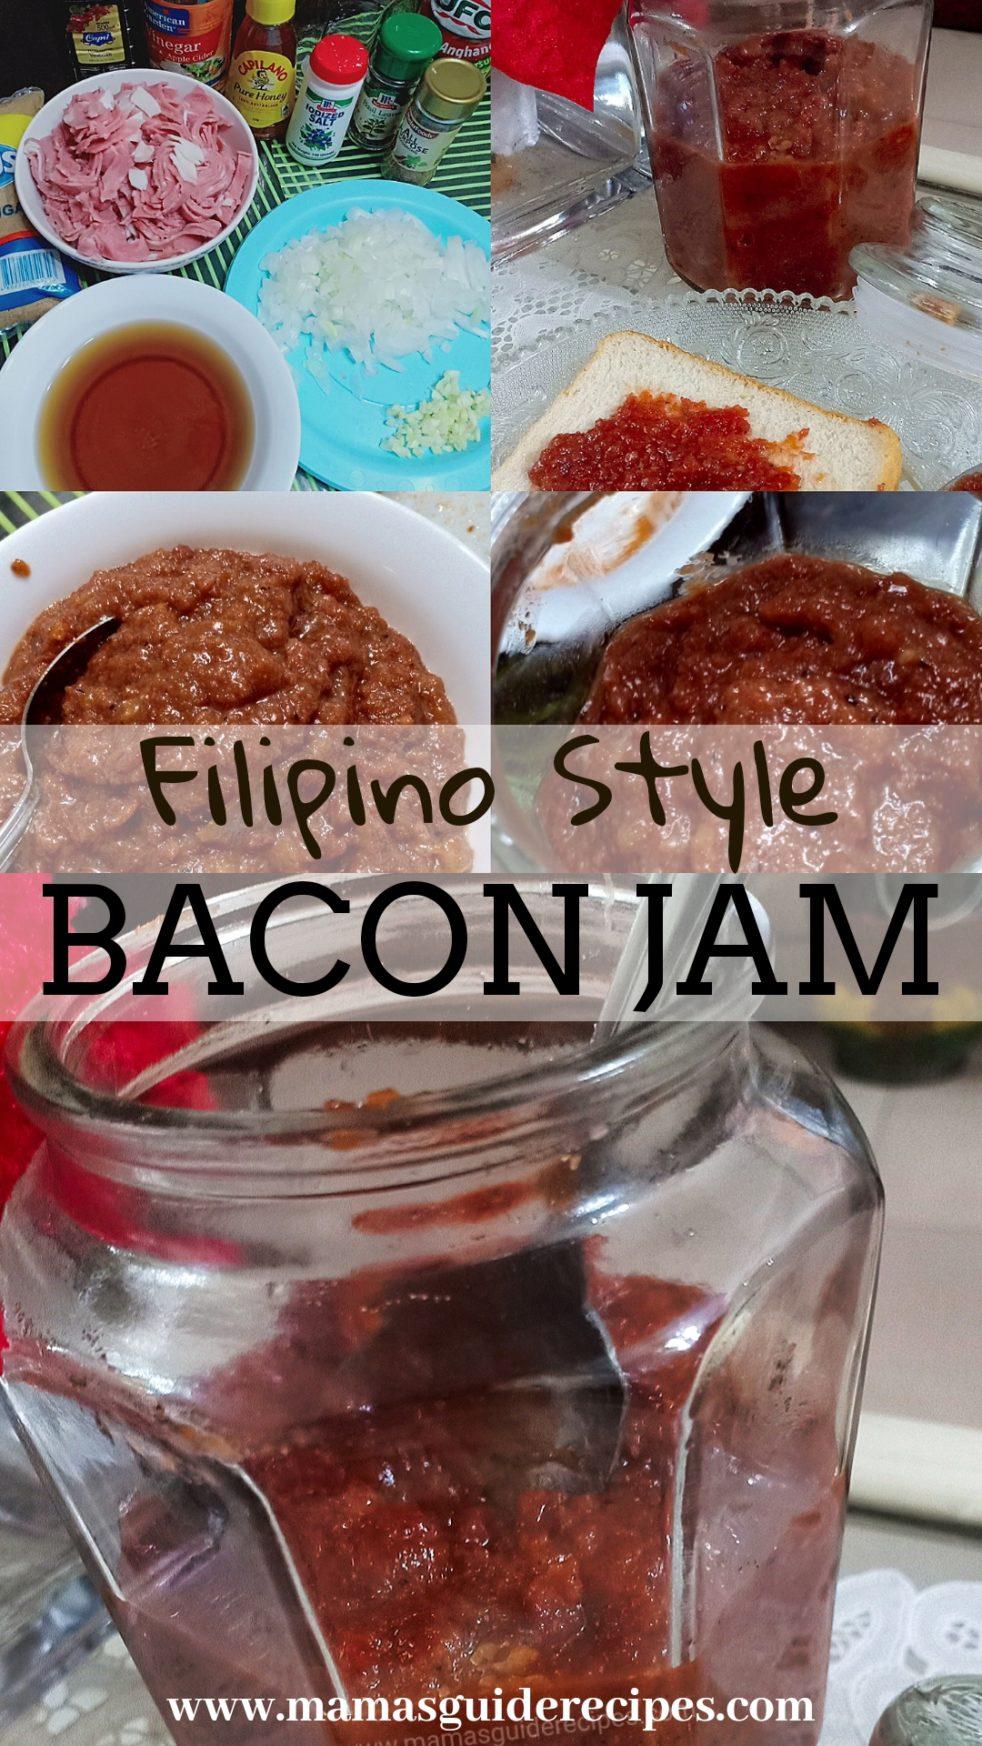 FILIPINO STYLE BACON JAM